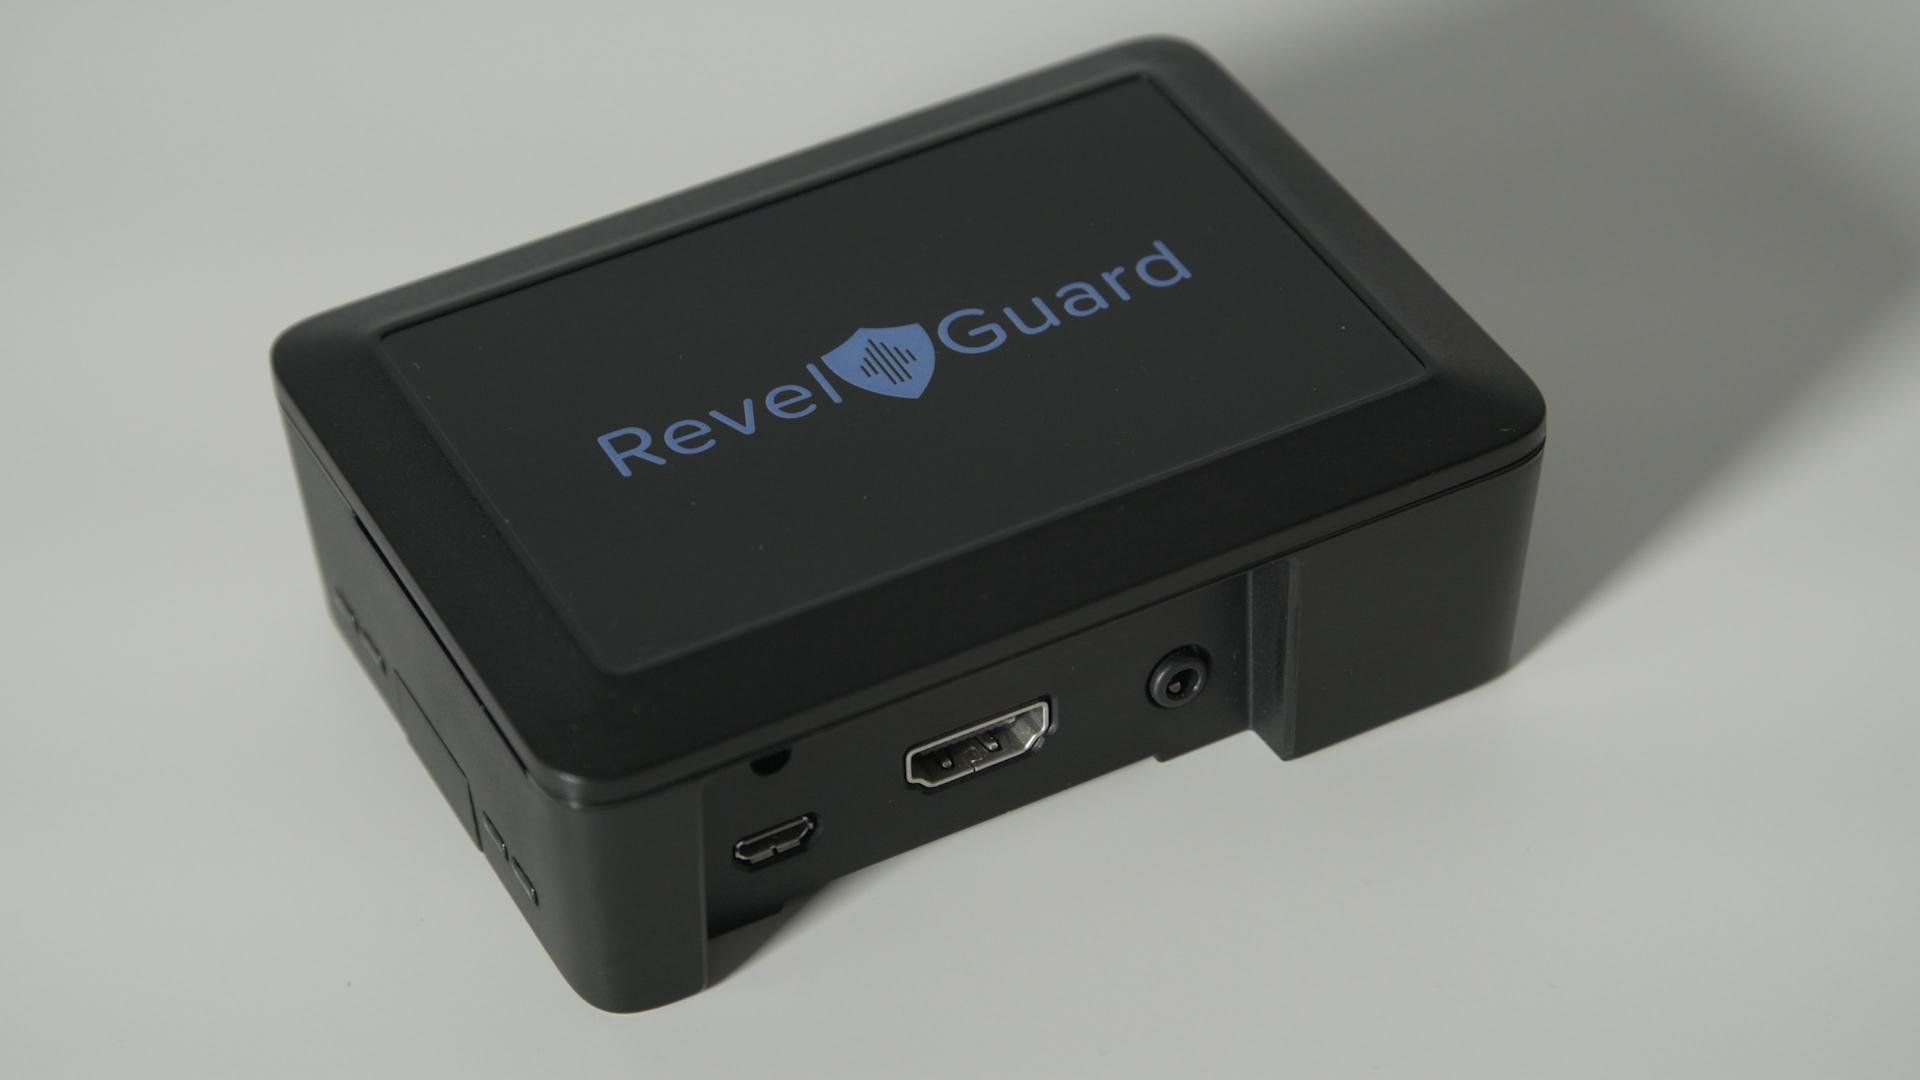 RevelGuard